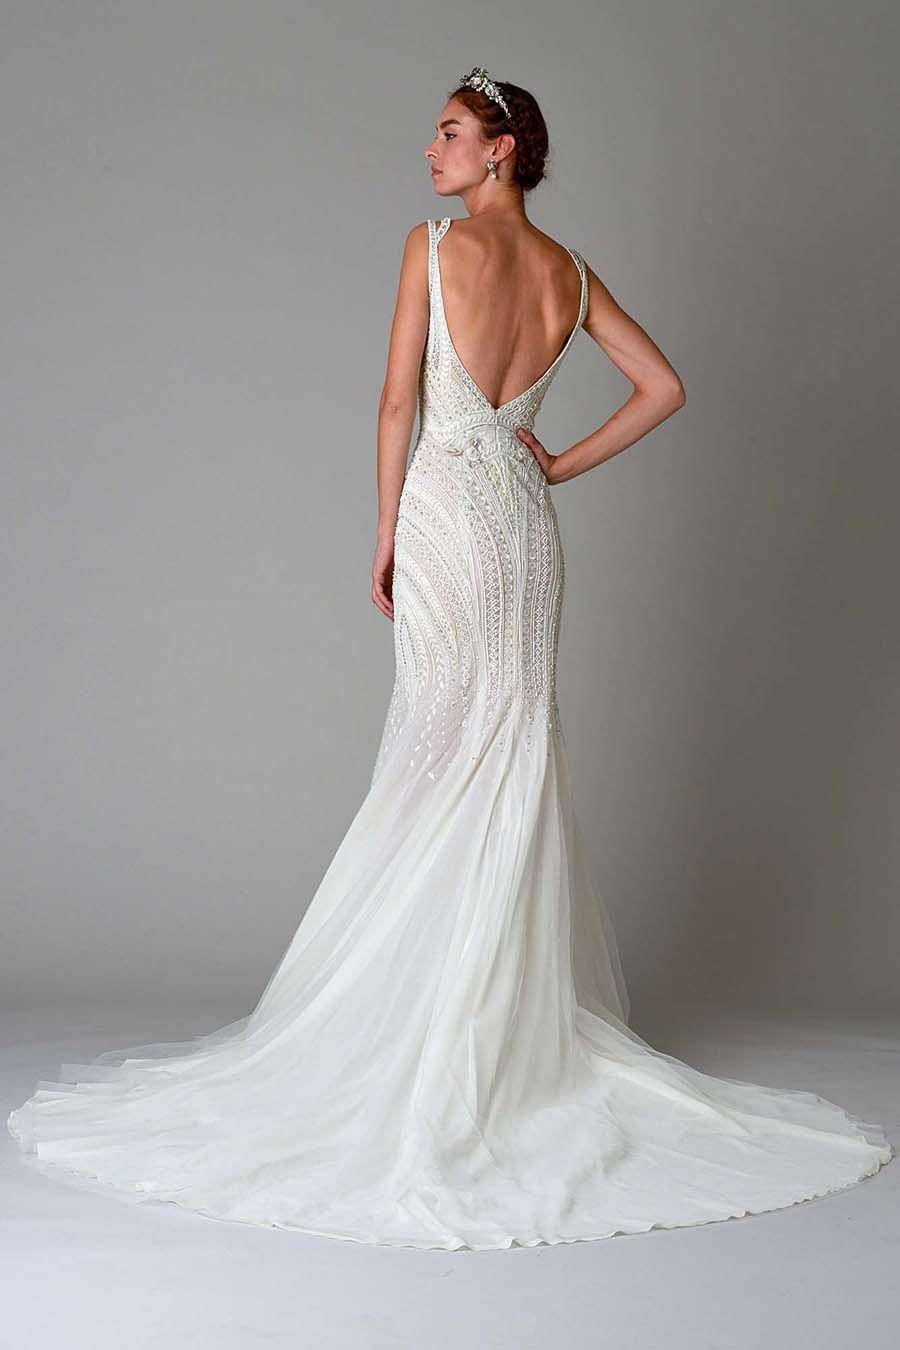 Silk Mermaid Wedding Dresses at Exclusive Wedding Decoration and ...